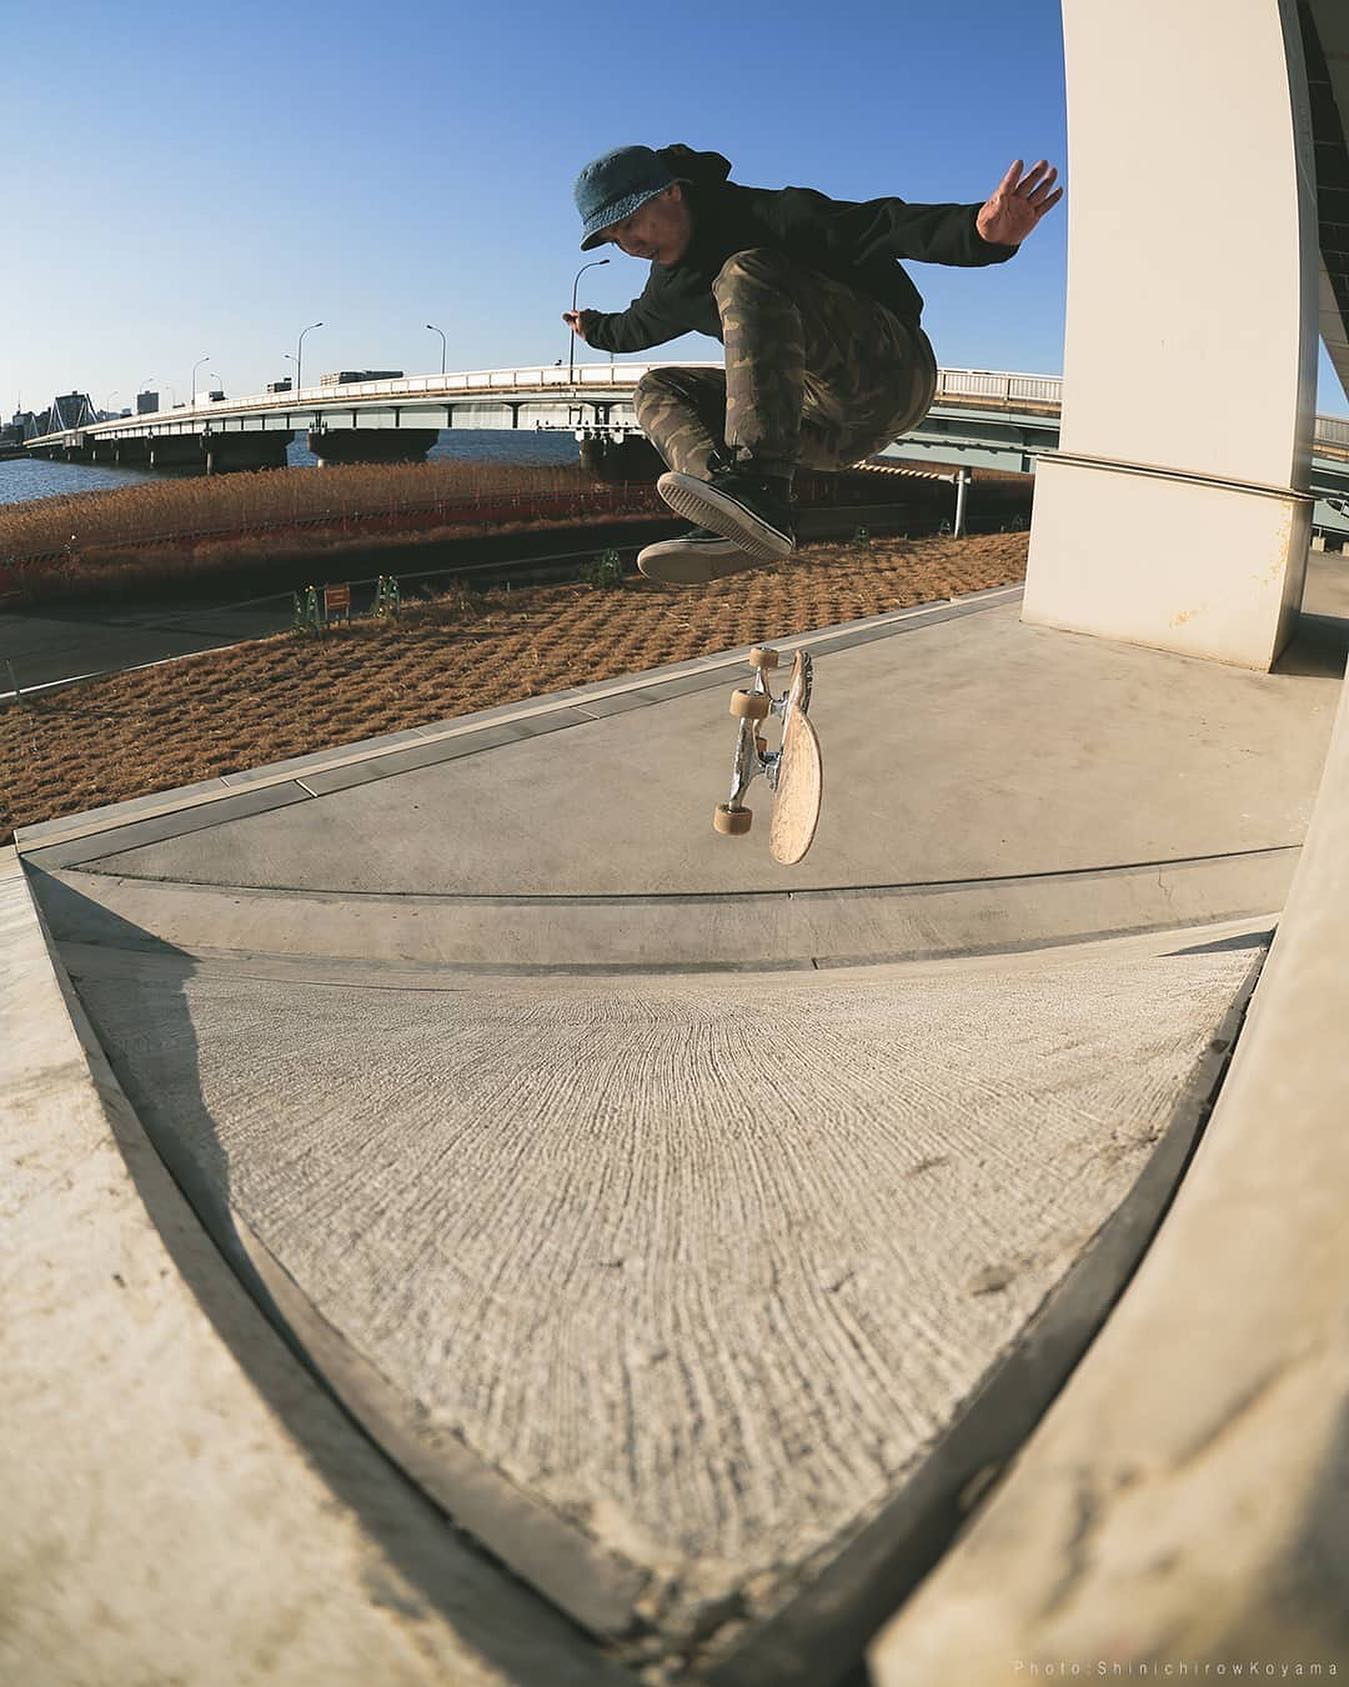 #repost @sitamatitama・・・Nollie Heel  @uenodriver 有難う御座います #instantskateboardshop #upproject次の場所を探さねば技も増やさねば#skate #skateboard #nollieheel #photo #skatephoto #street #favoritetrick #ありがとう#有難う御座います